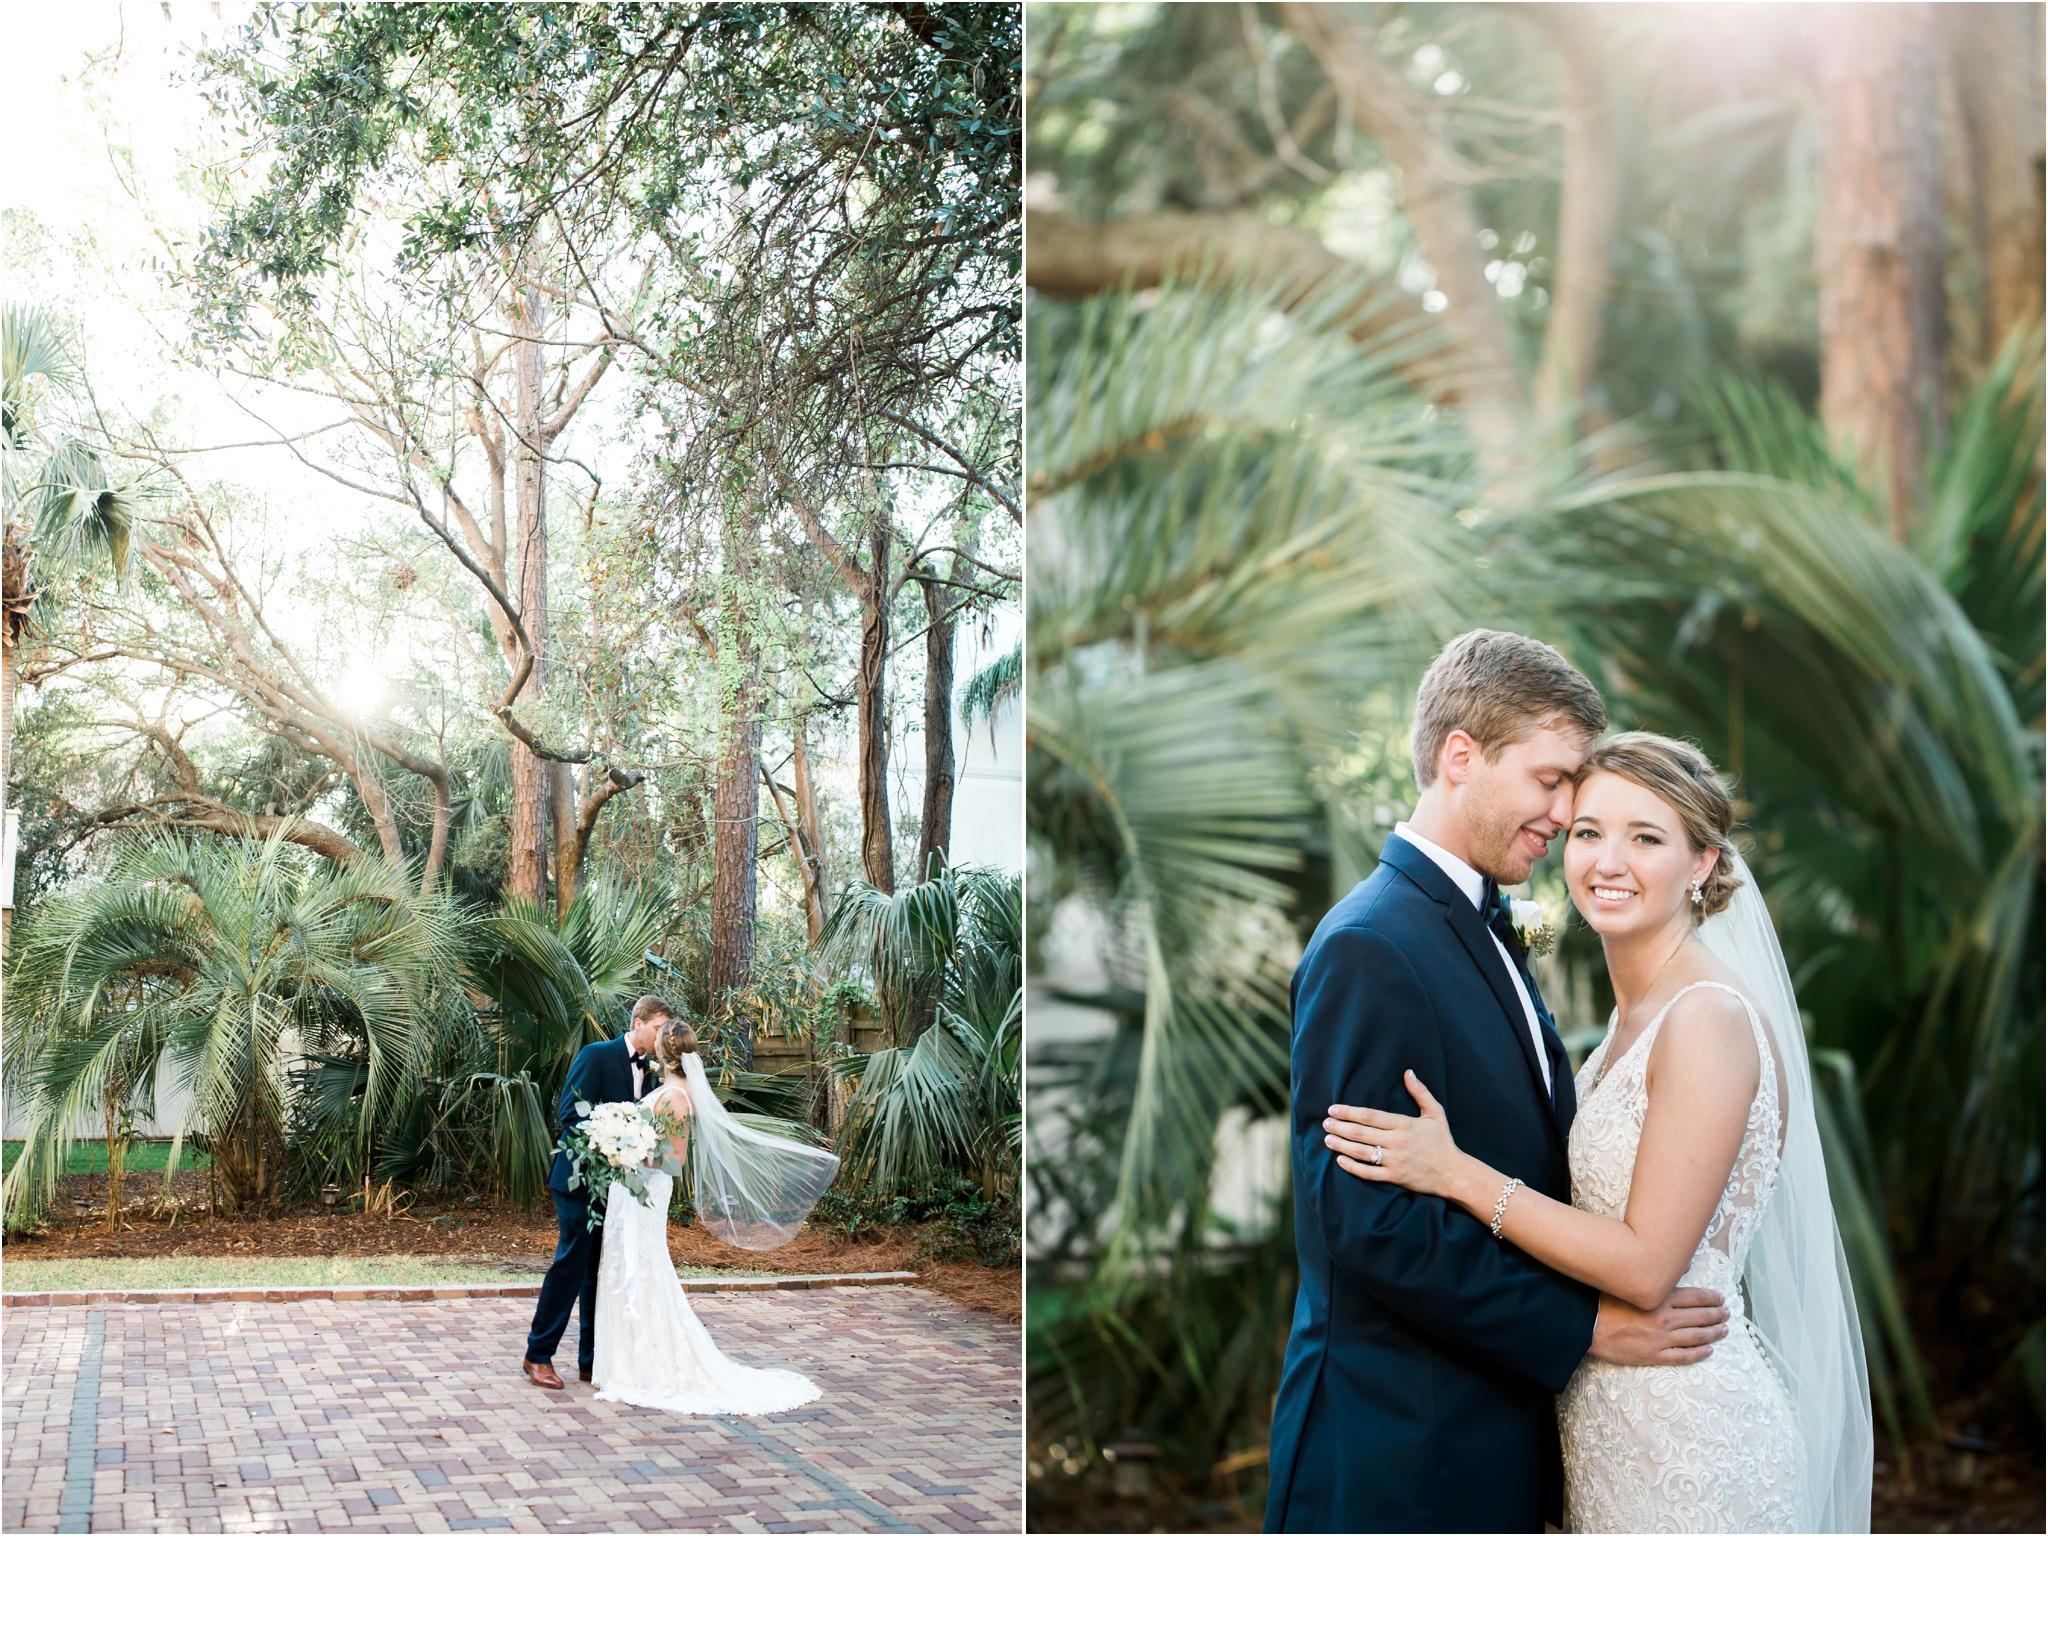 Rainey_Gregg_Photography_St._Simons_Island_Georgia_California_Wedding_Portrait_Photography_0670.jpg